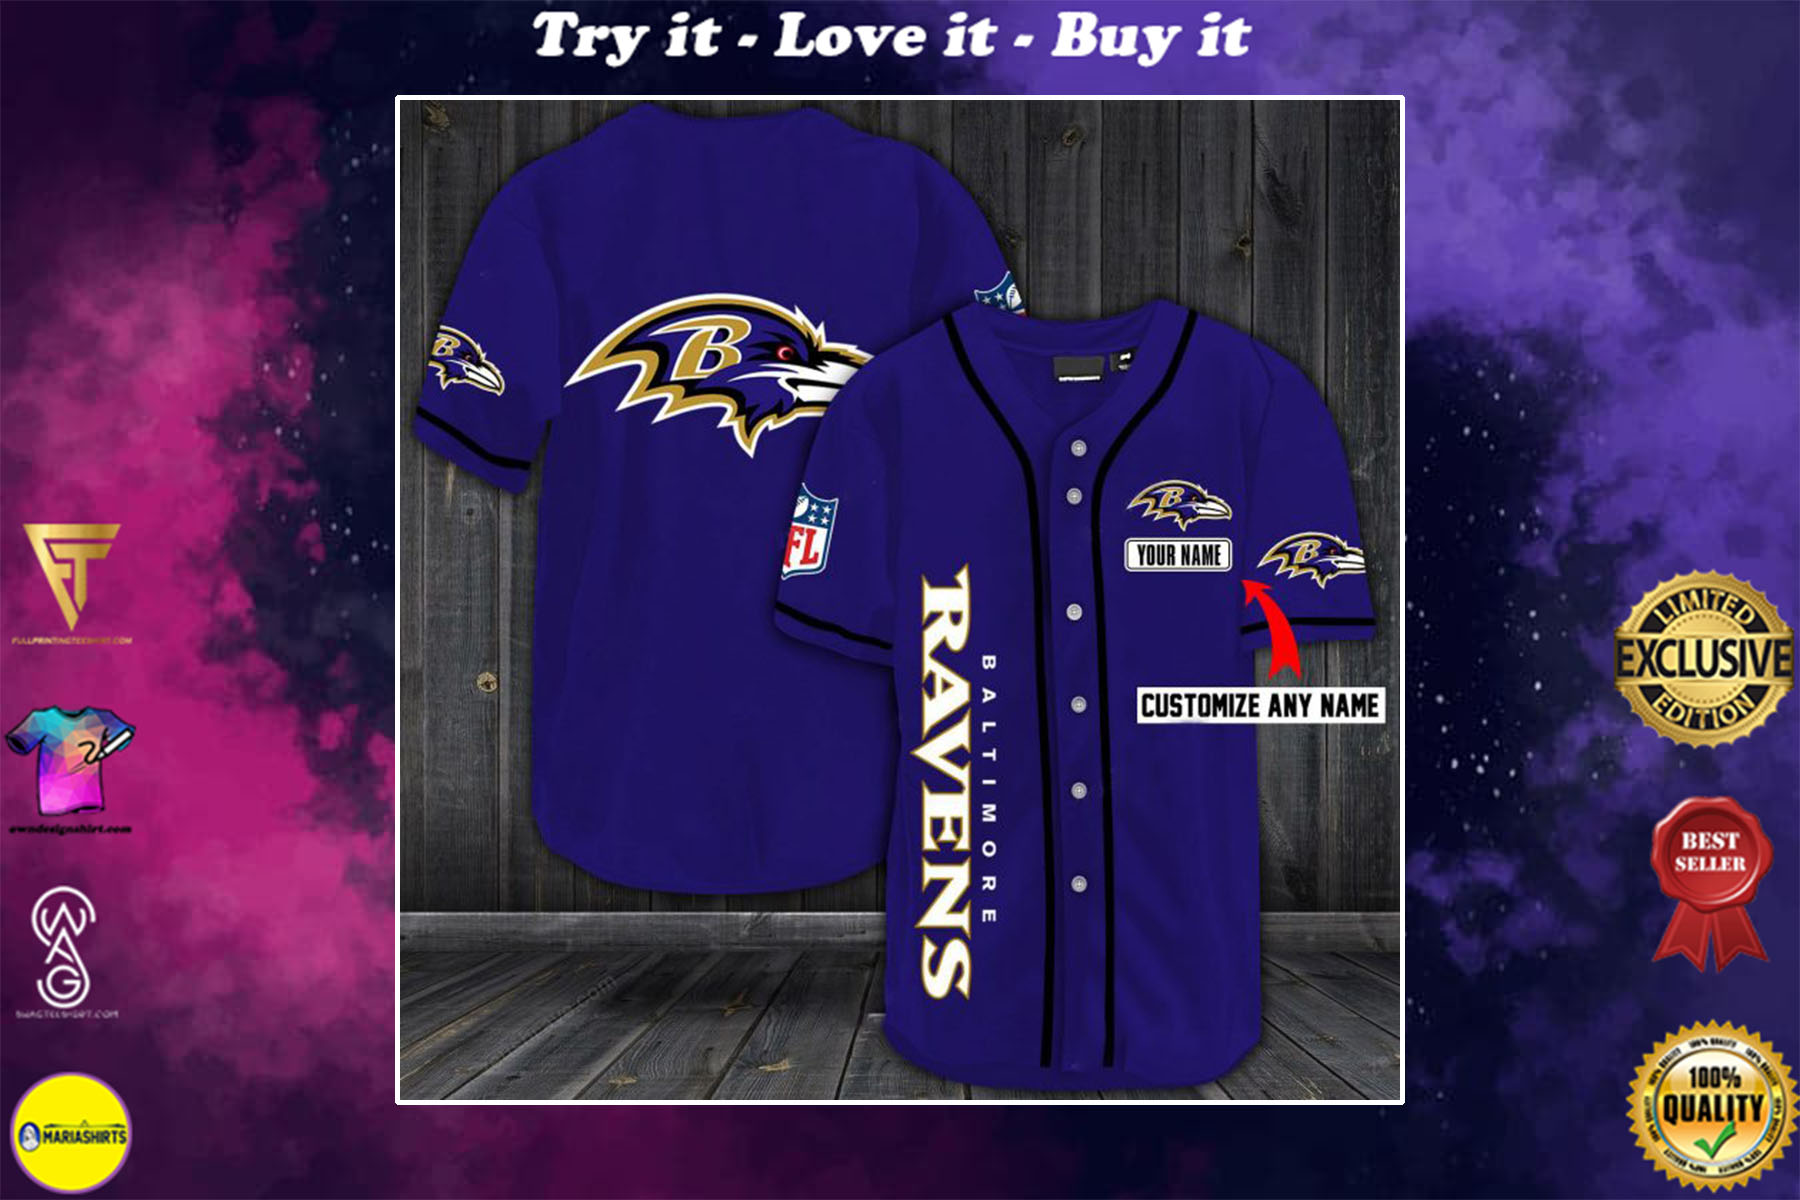 personalized name baltimore ravens baseball shirt